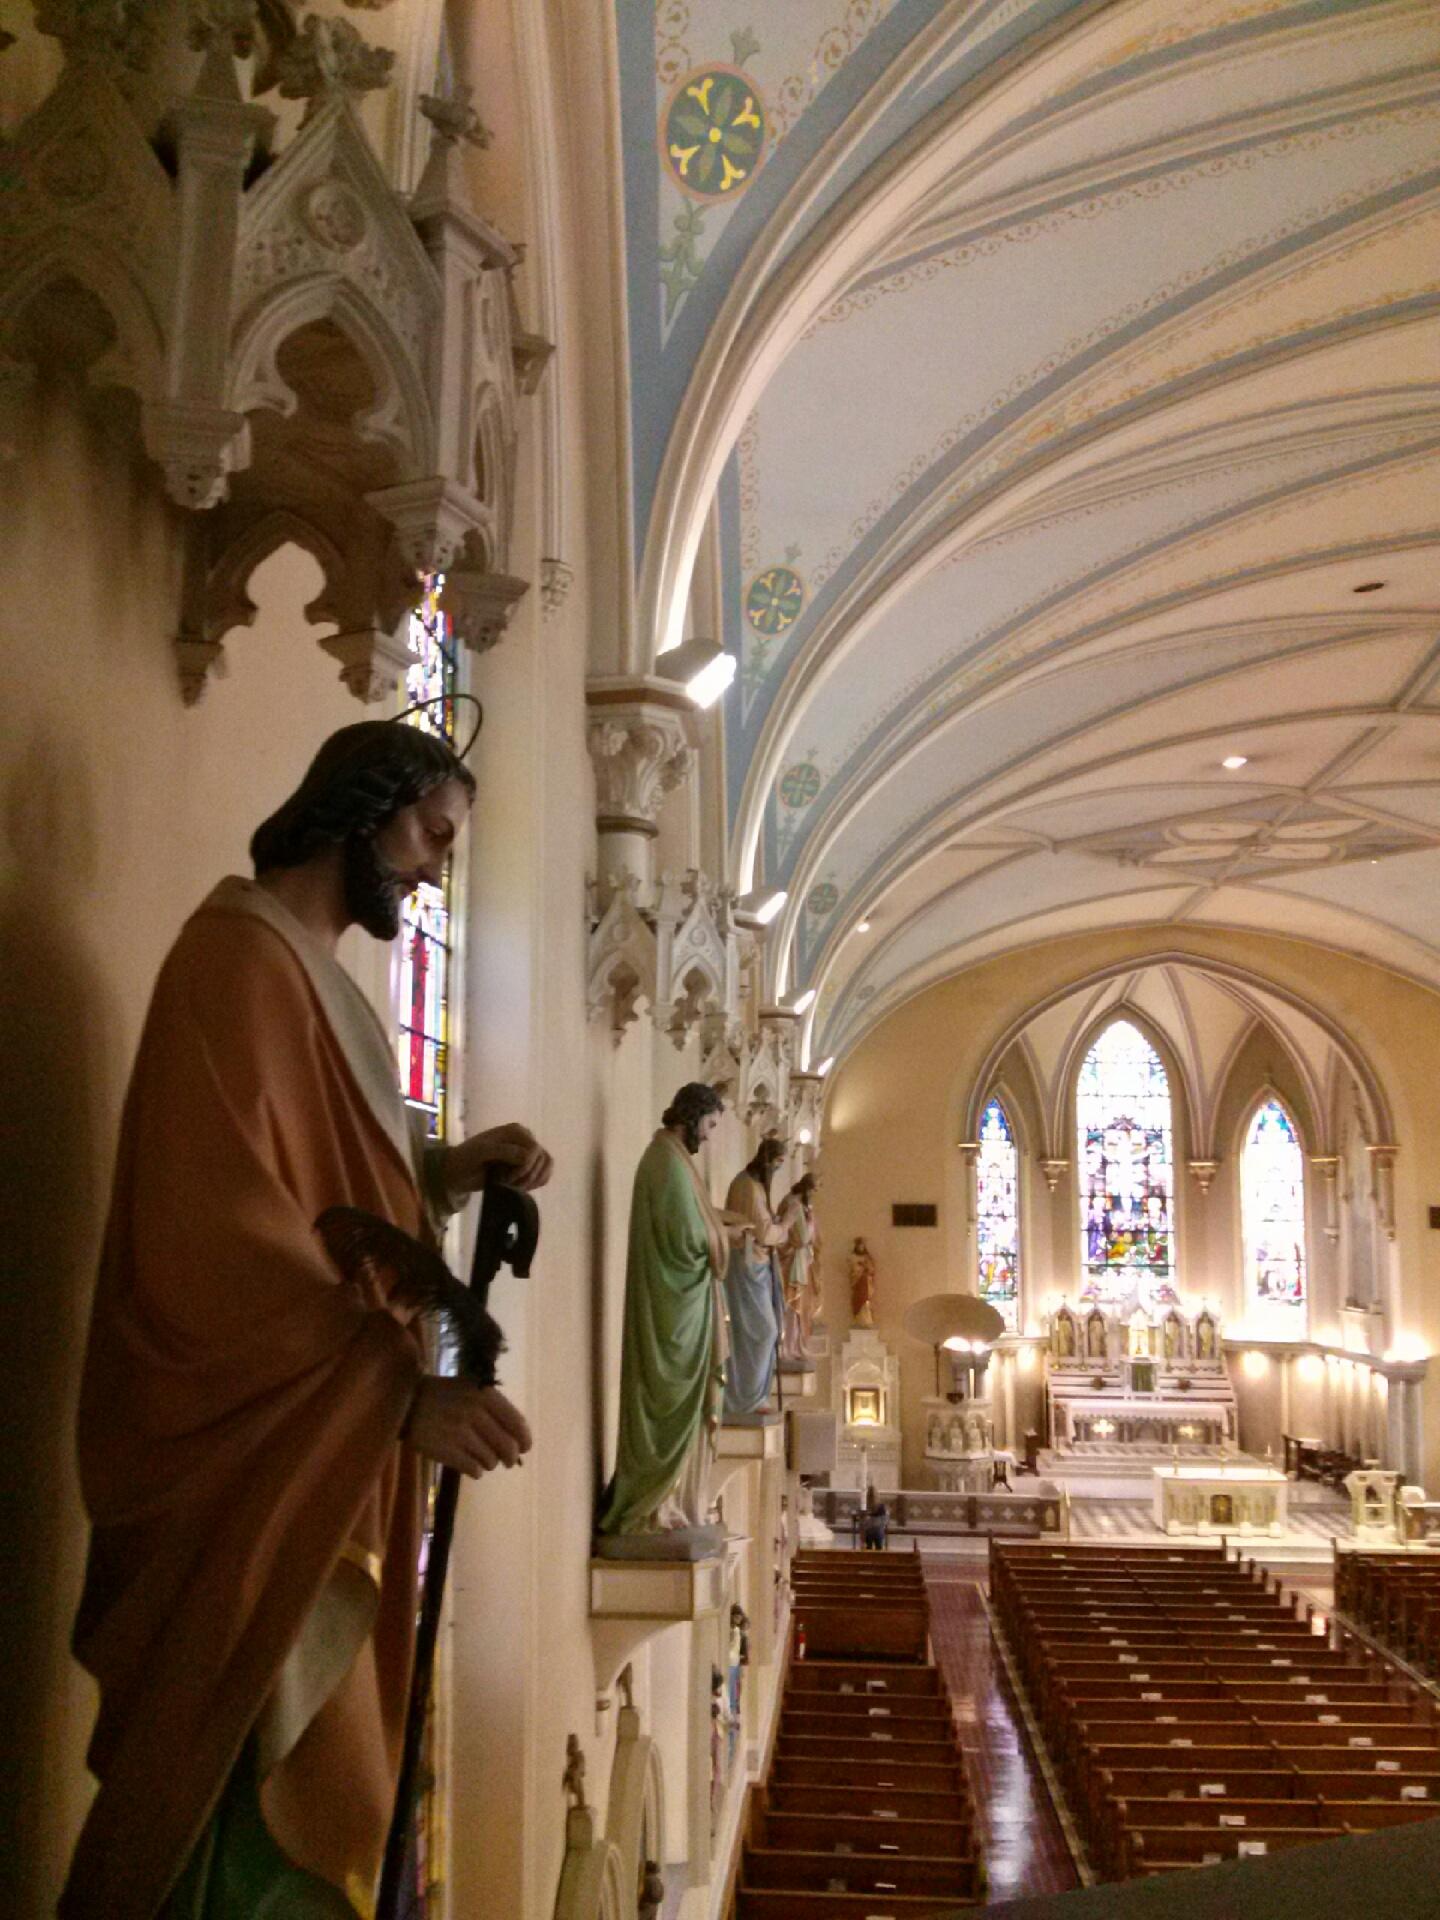 filest martin of tours catholic church interior